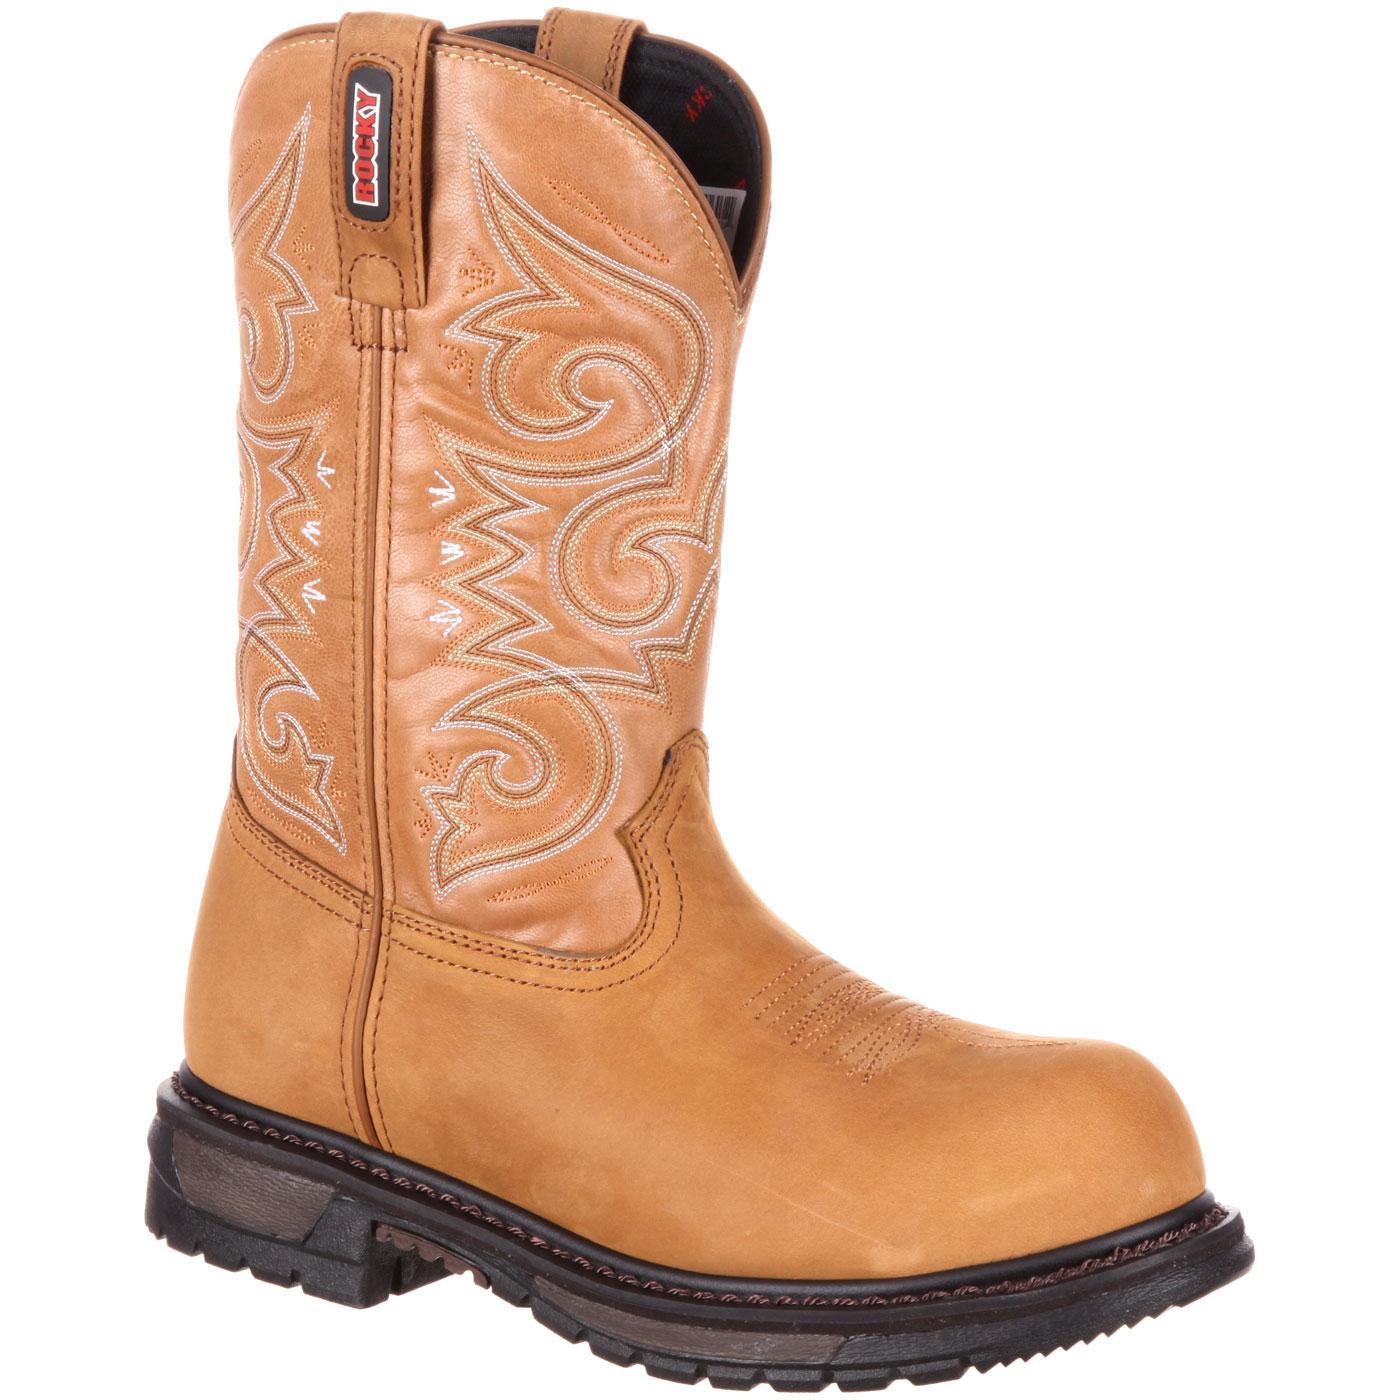 9559507ac51 Rocky Womens Original Ride Composite Toe Waterproof Western Boot RKW0175